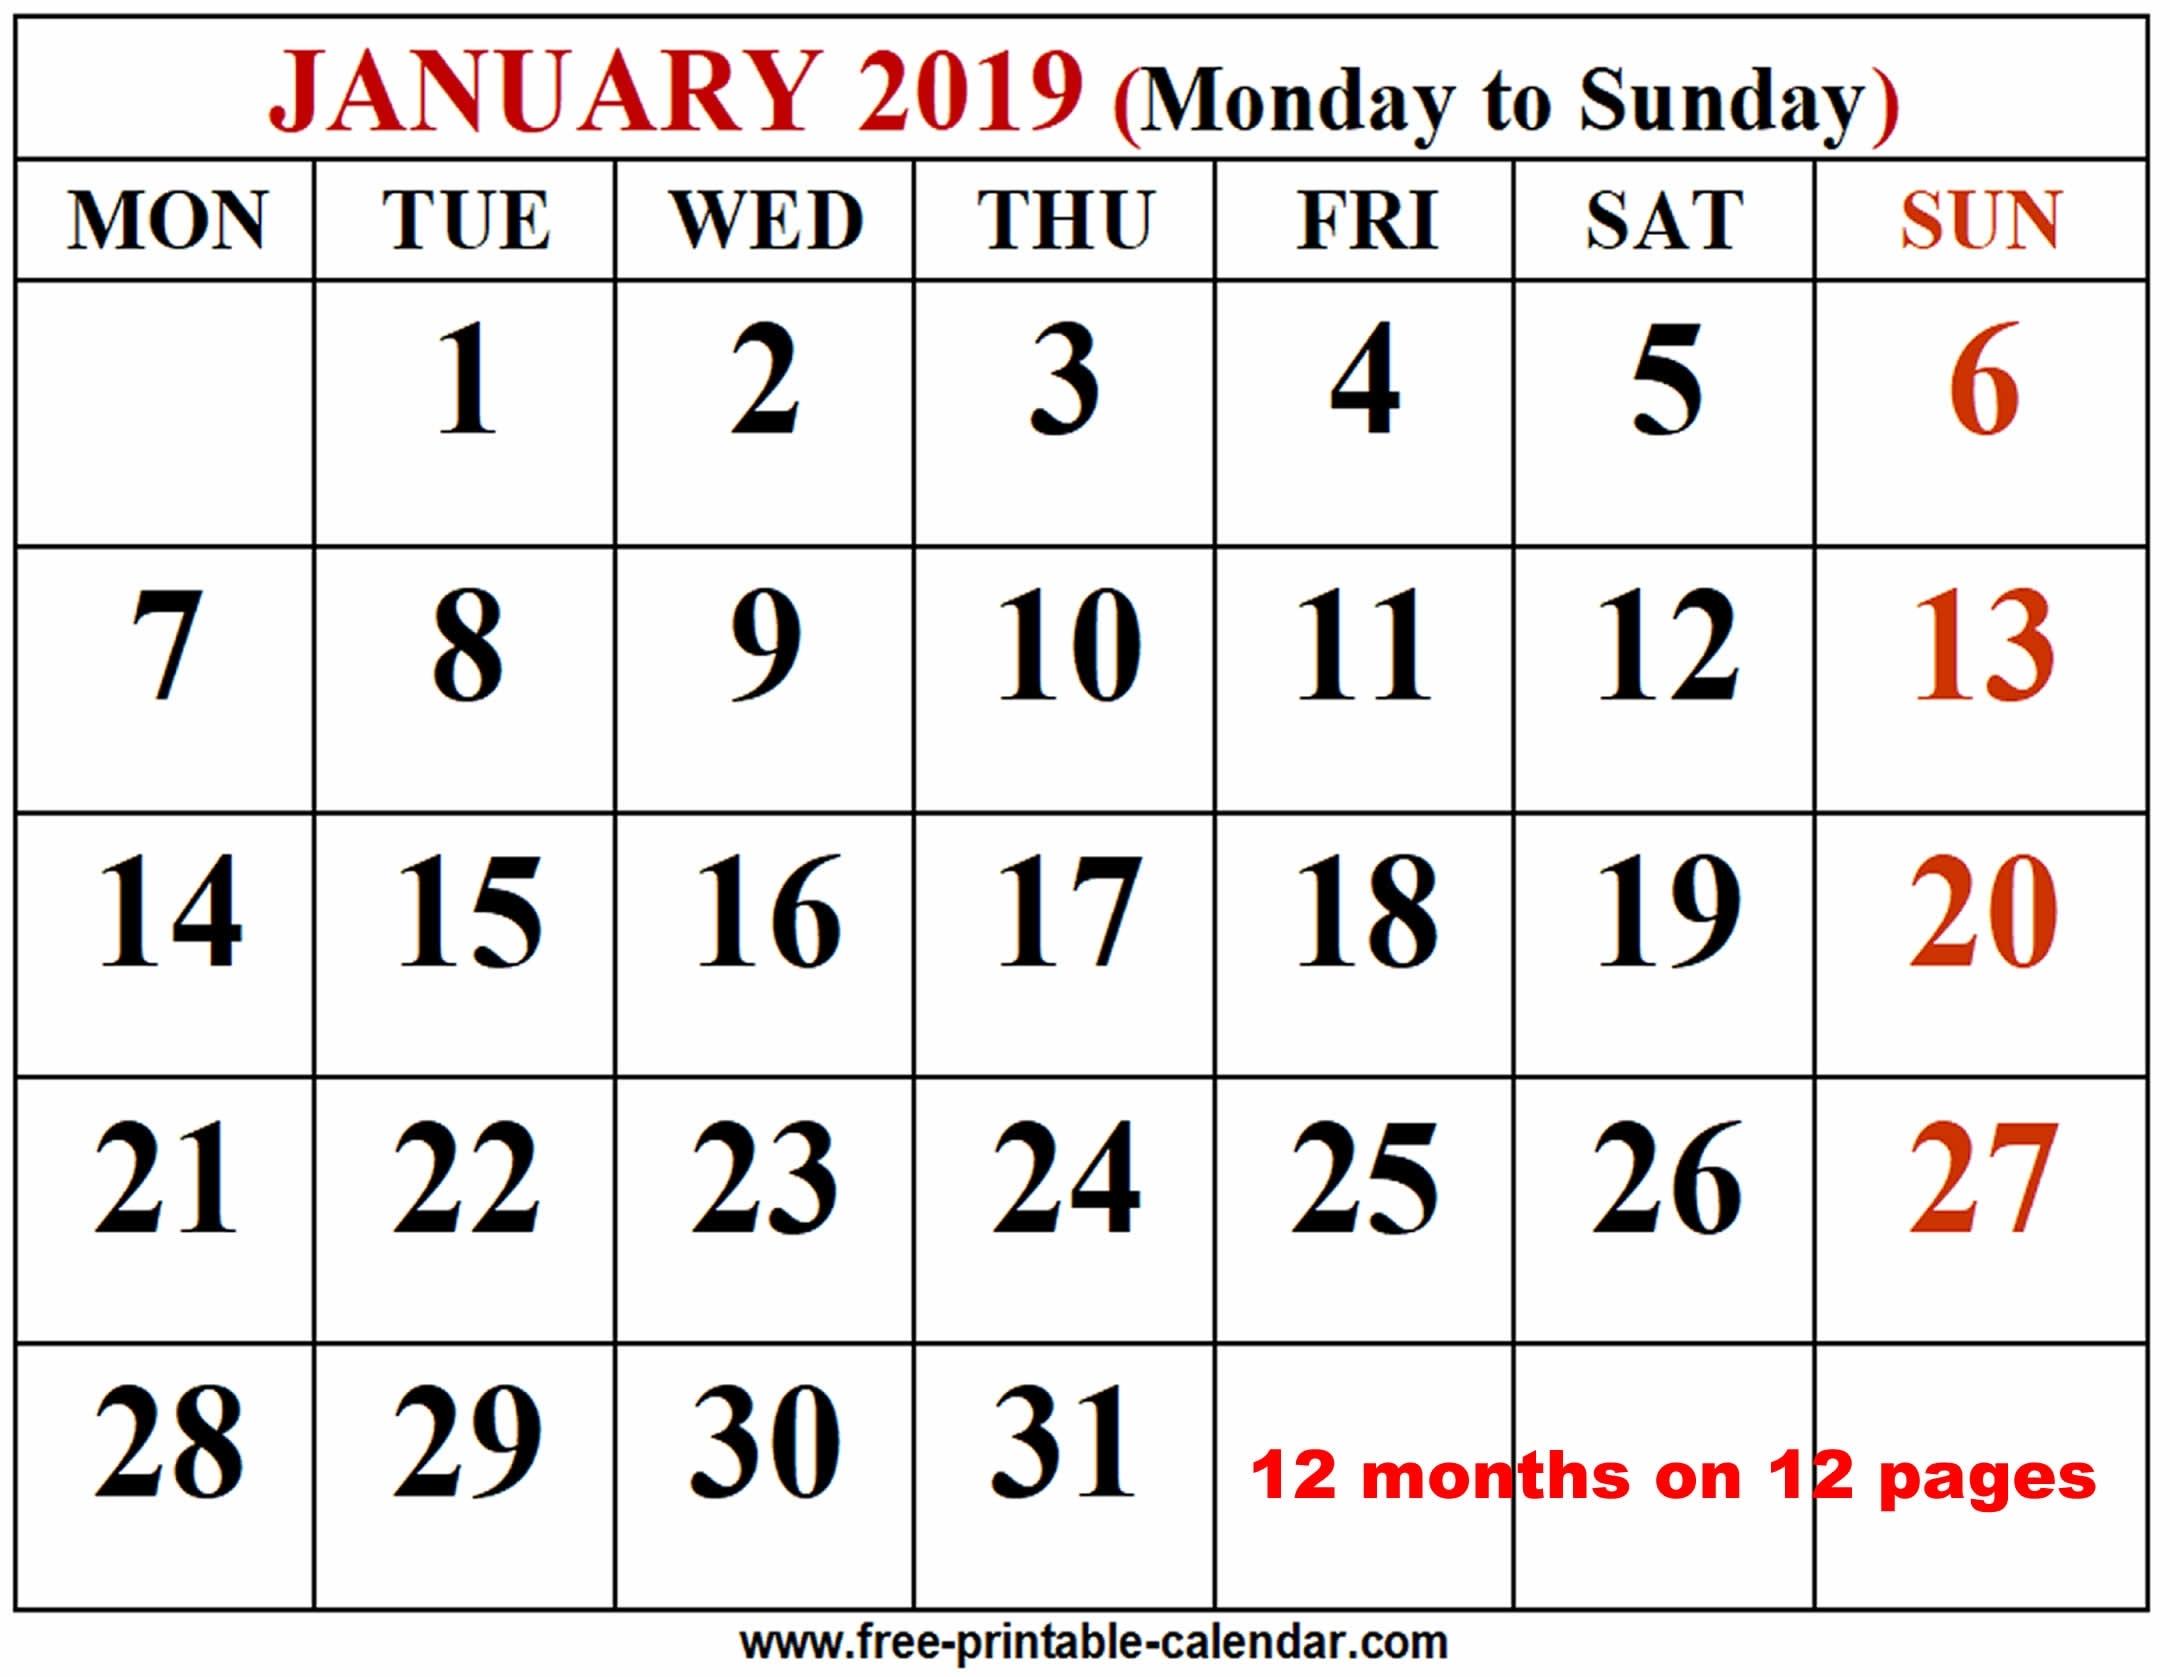 2019 Calendar Template - Free-Printable-Calendar for Free Printable 12 Month Blank Calendar